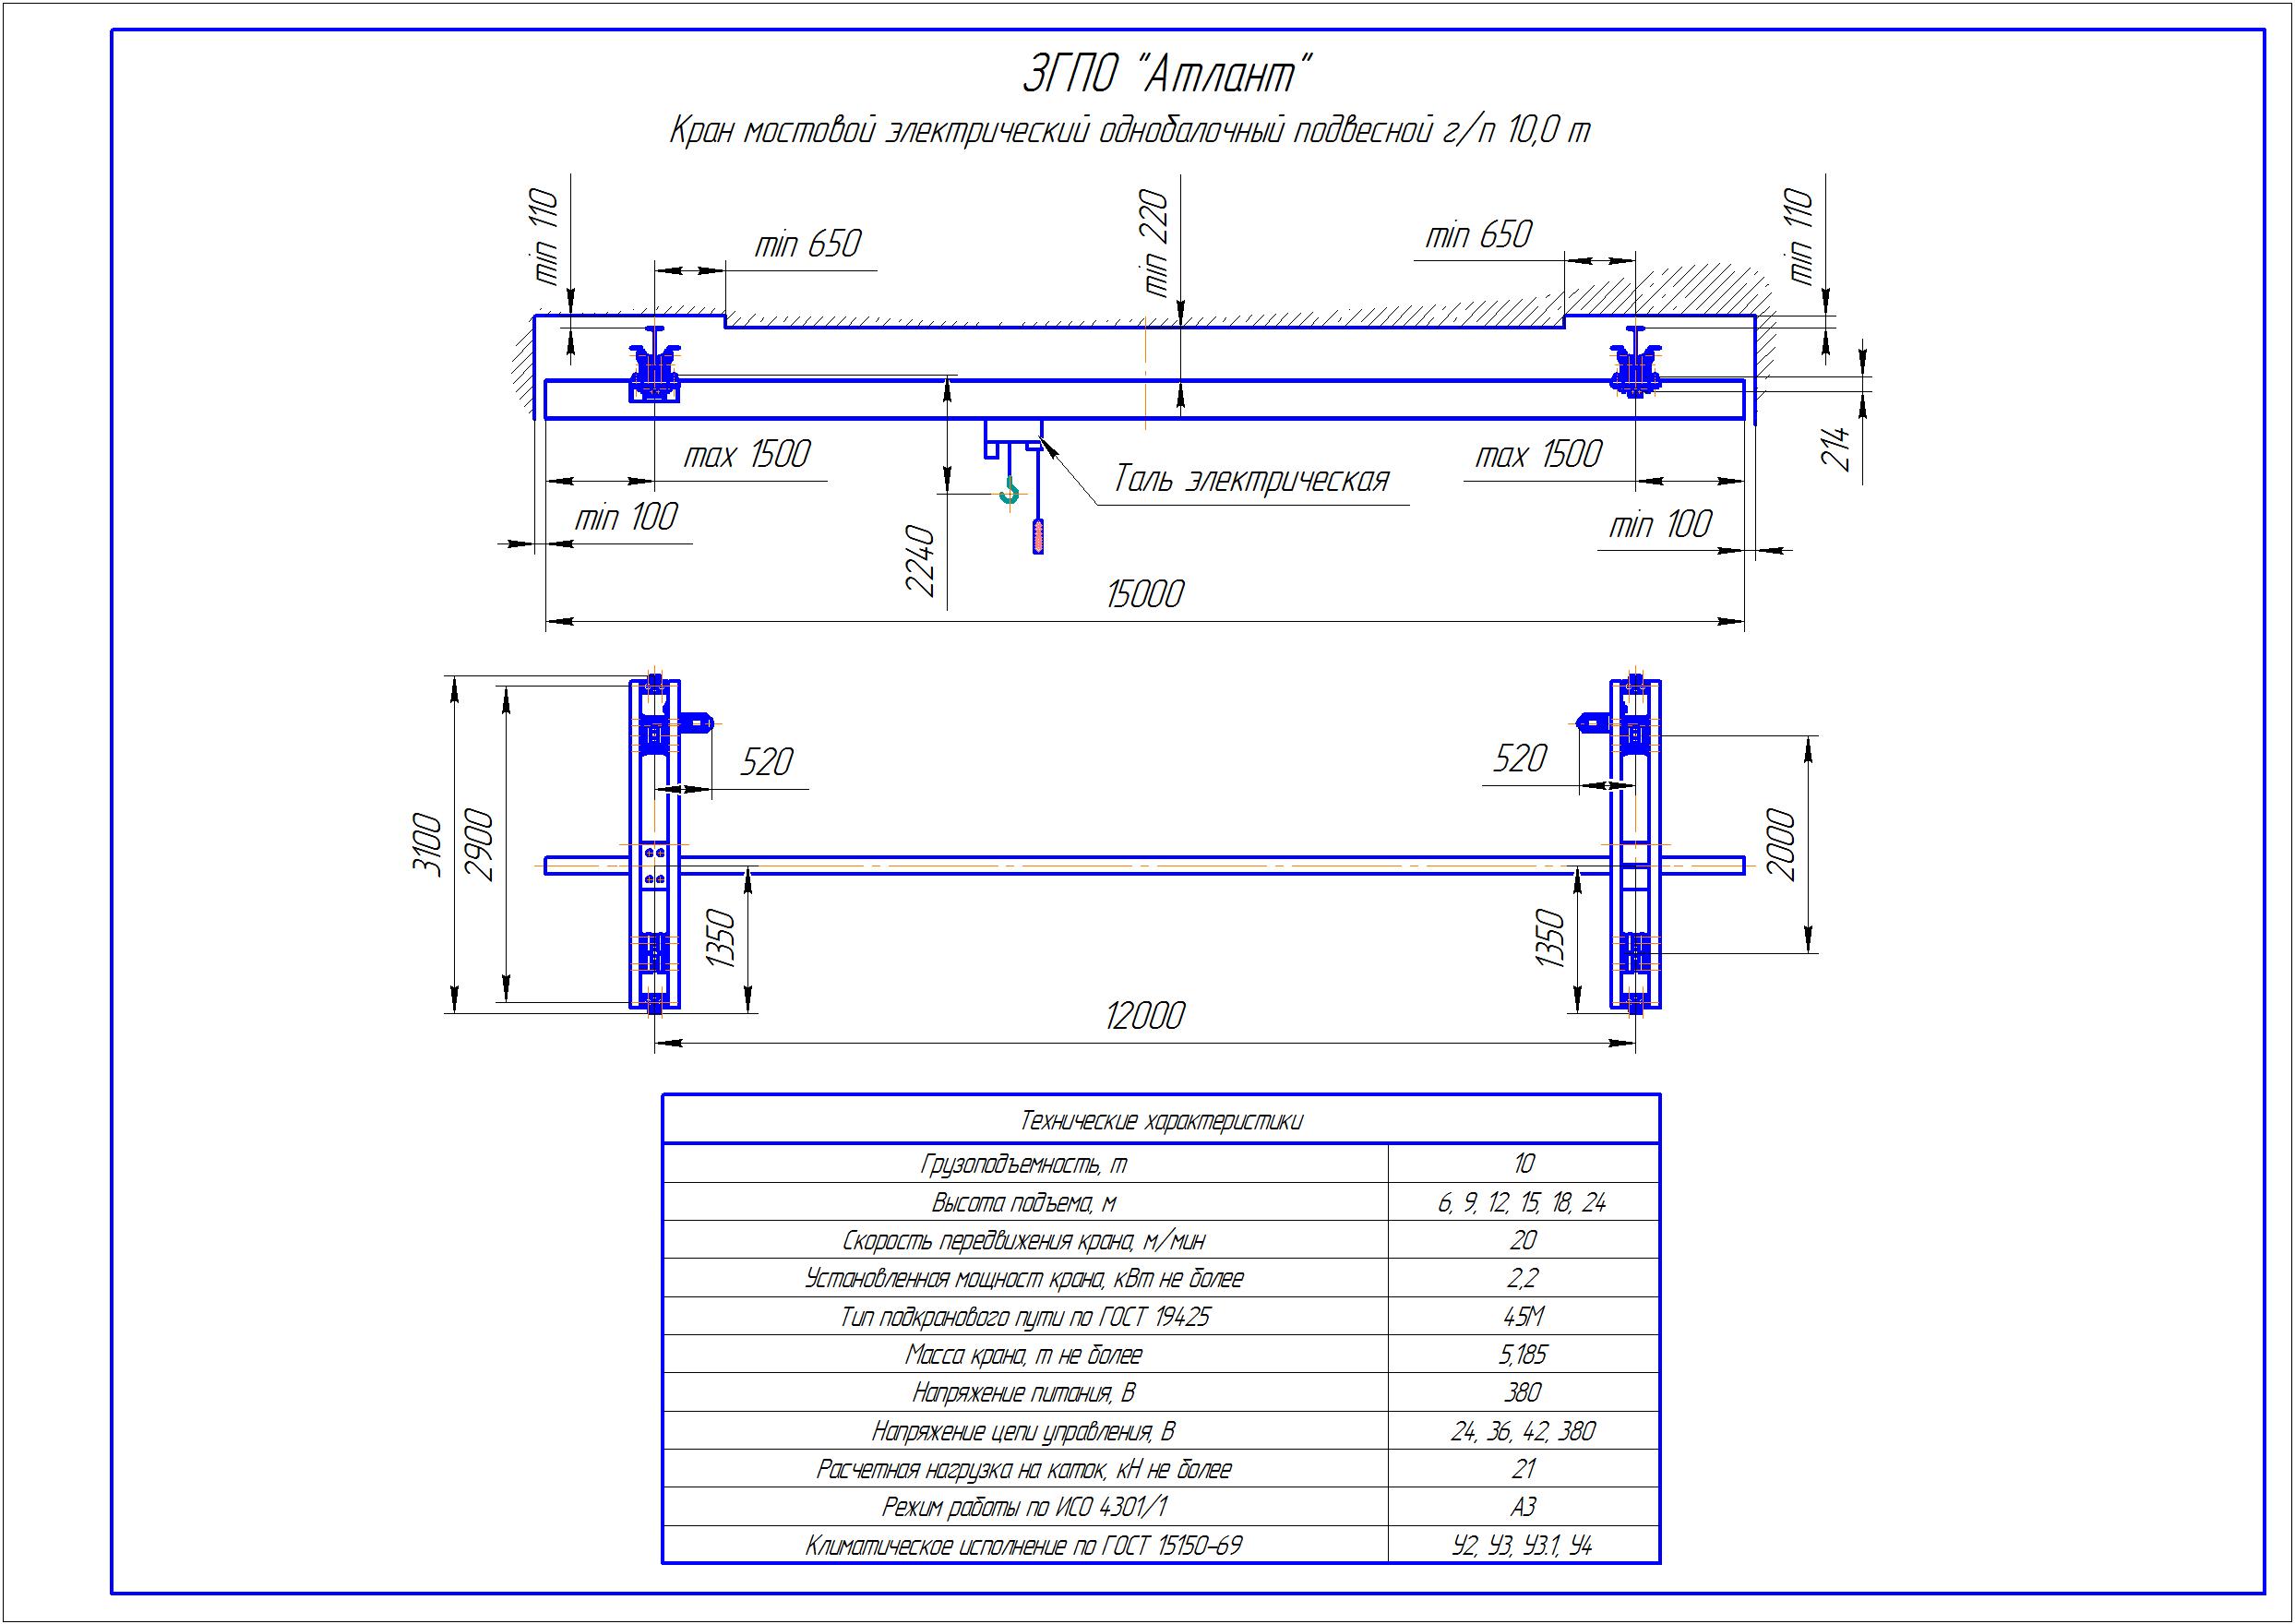 KBP 7 4 - Подвесная кран балка